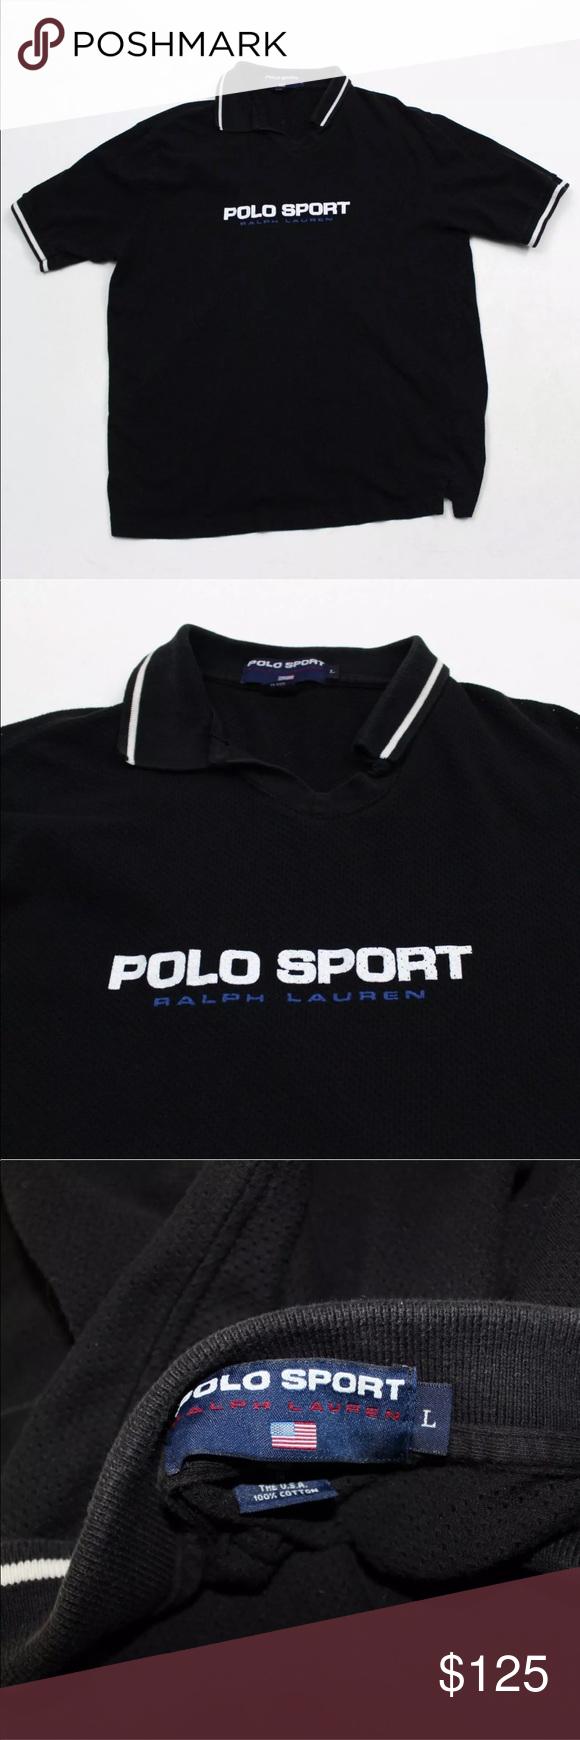 Men S Vintage Polo Sport Polo Clothes Design Fashion Design Vintage Polo